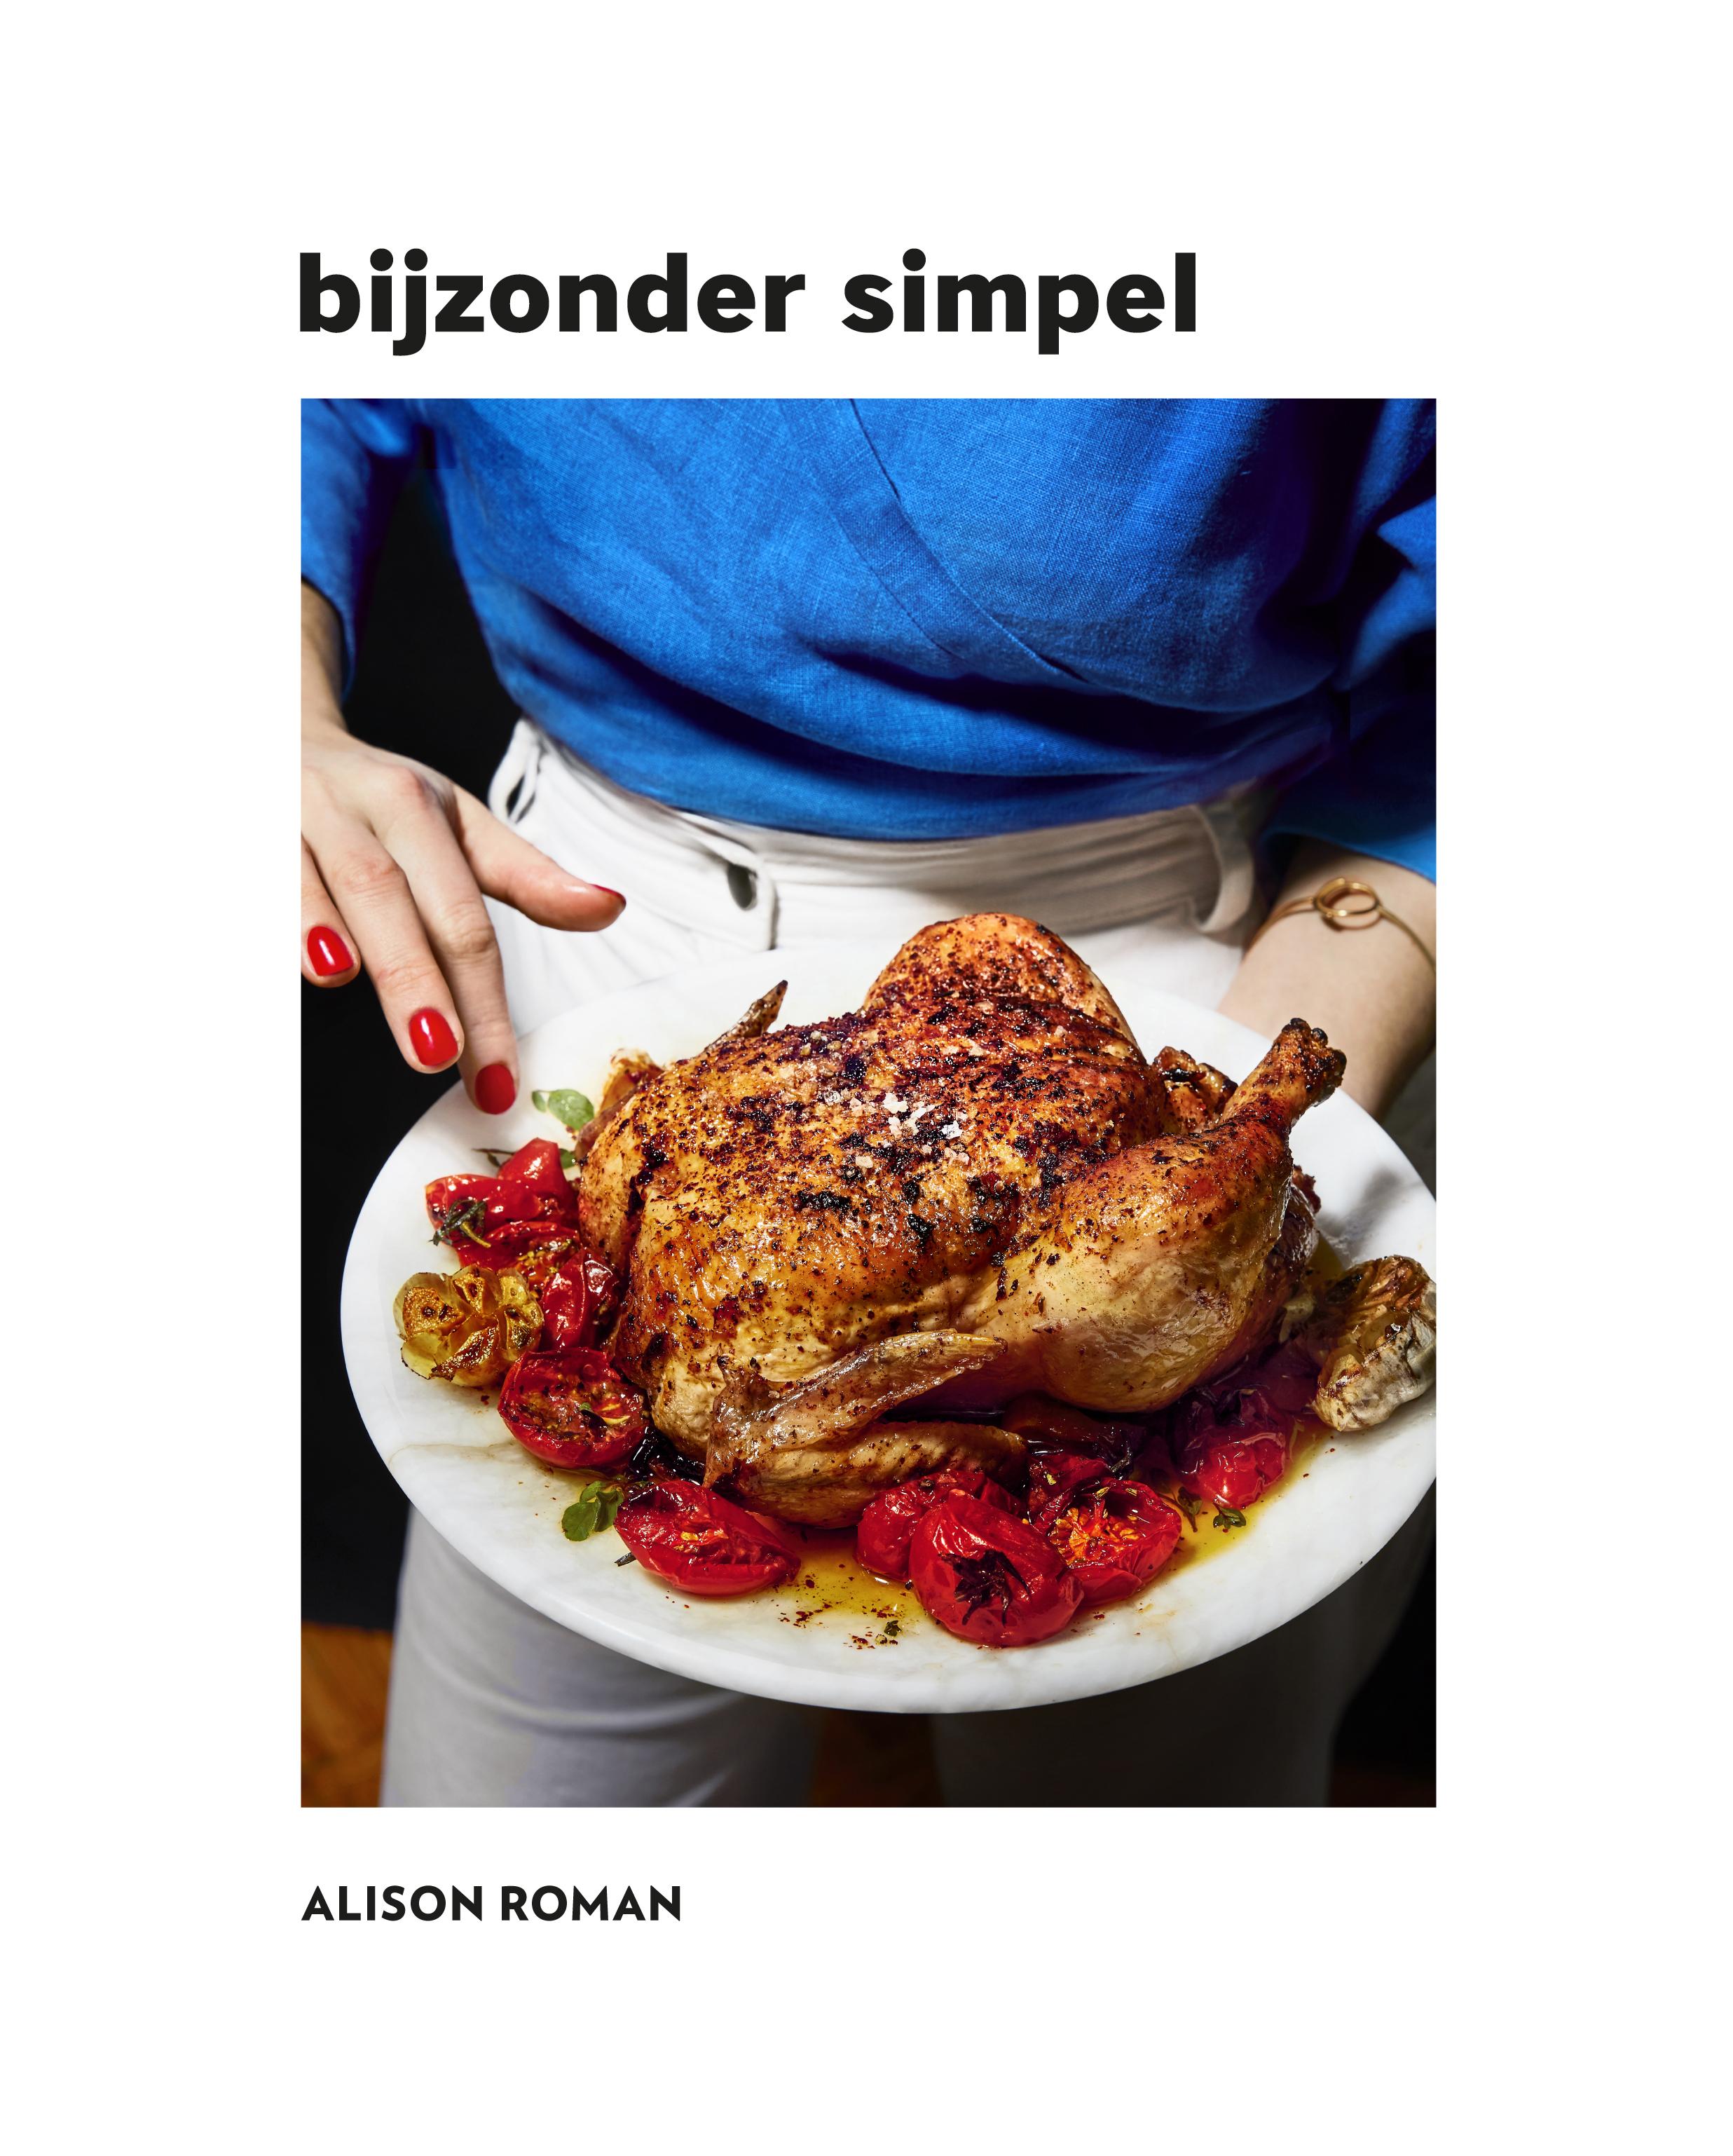 Bijzonder simpel, Alison Roman